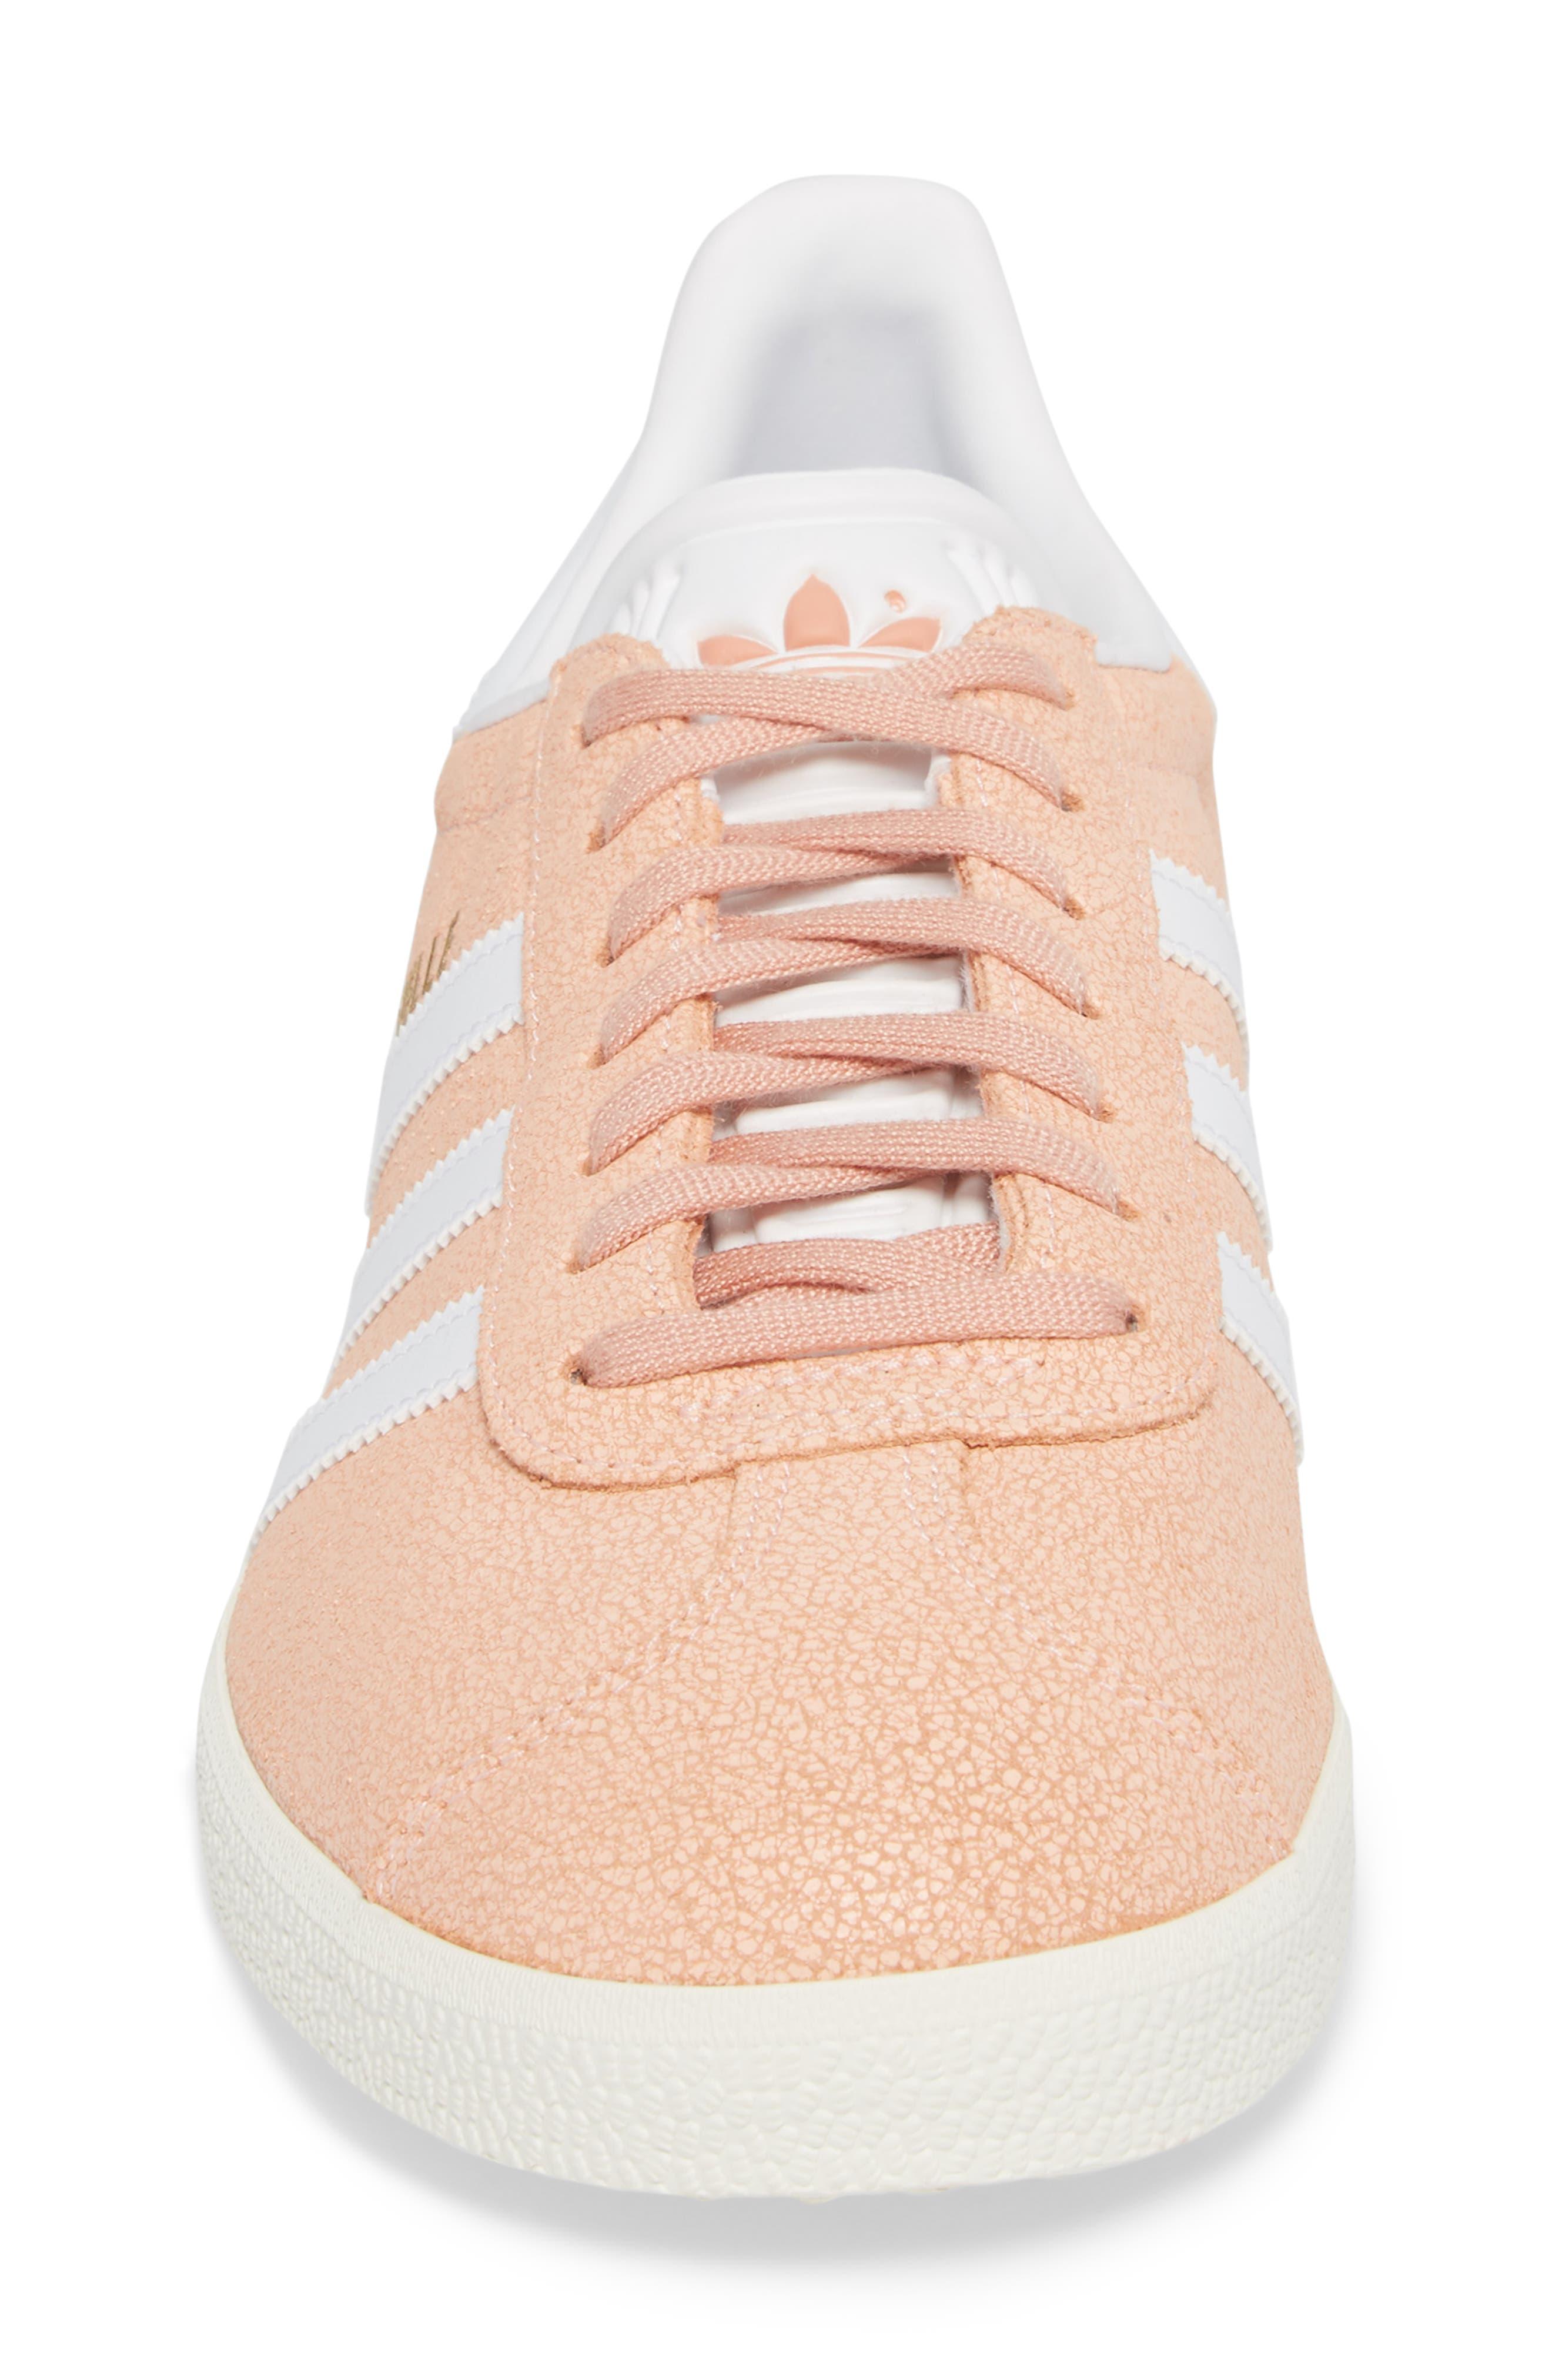 Gazelle Sneaker,                             Alternate thumbnail 4, color,                             Clear Orange/ White/ Off White